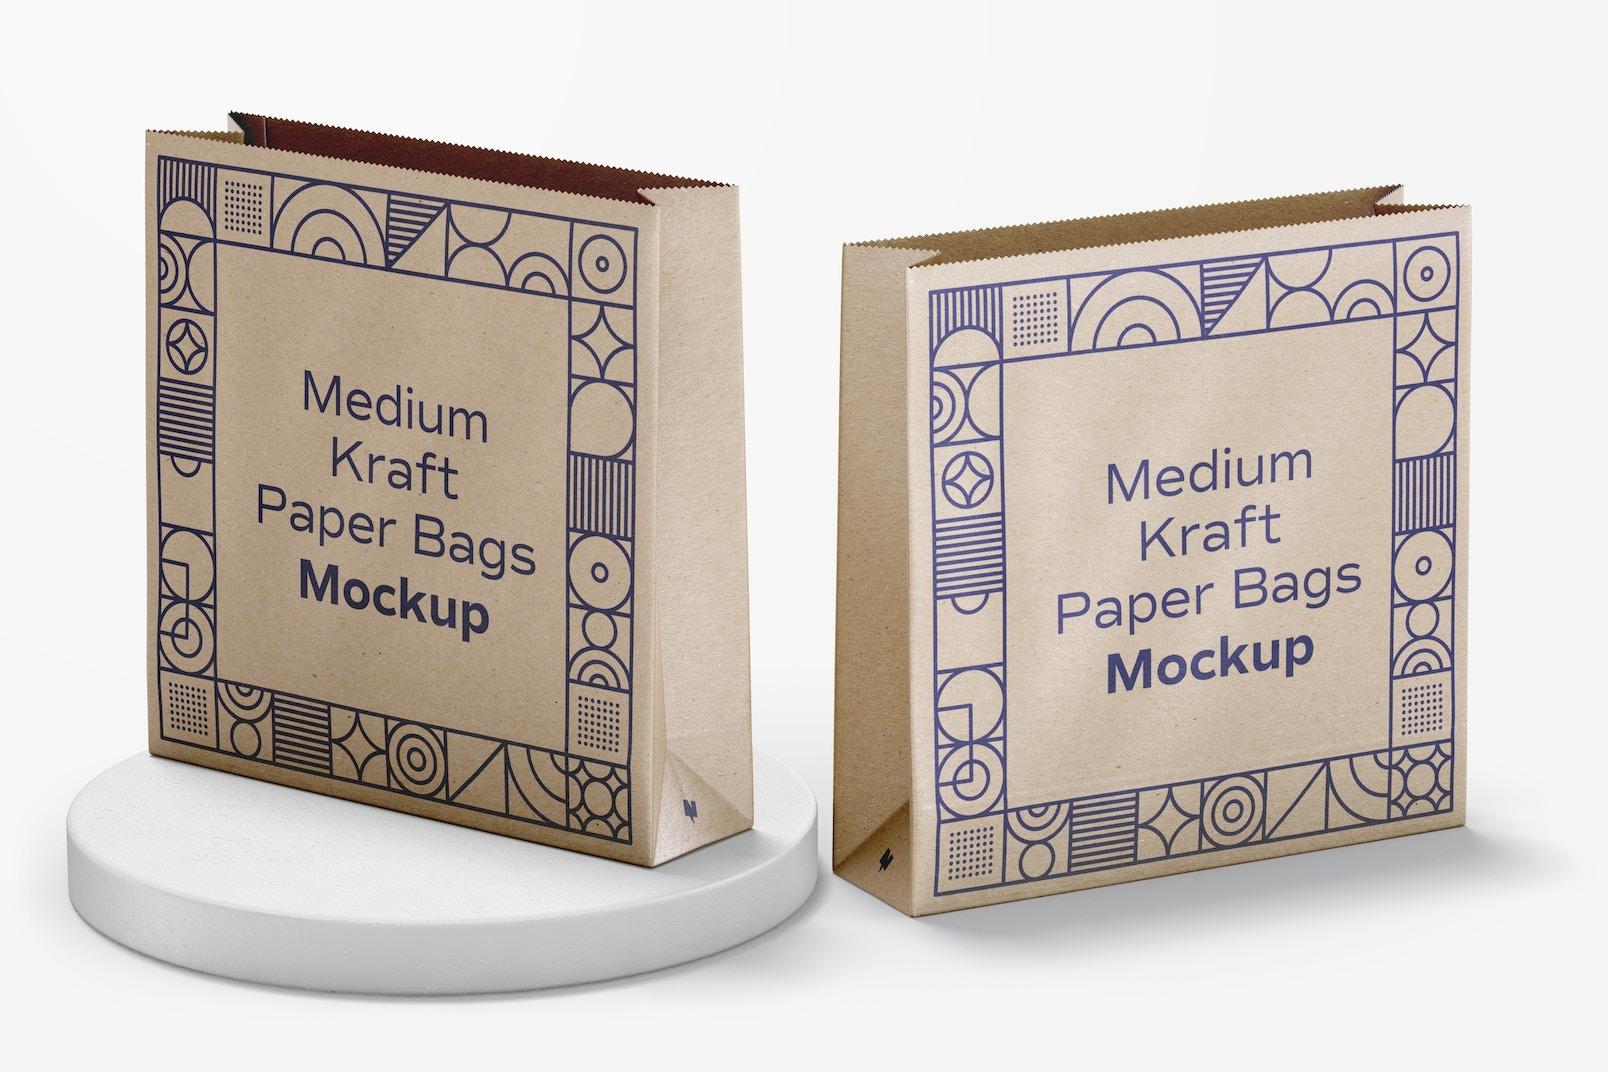 Medium Kraft Paper Bags Mockup, Perspective